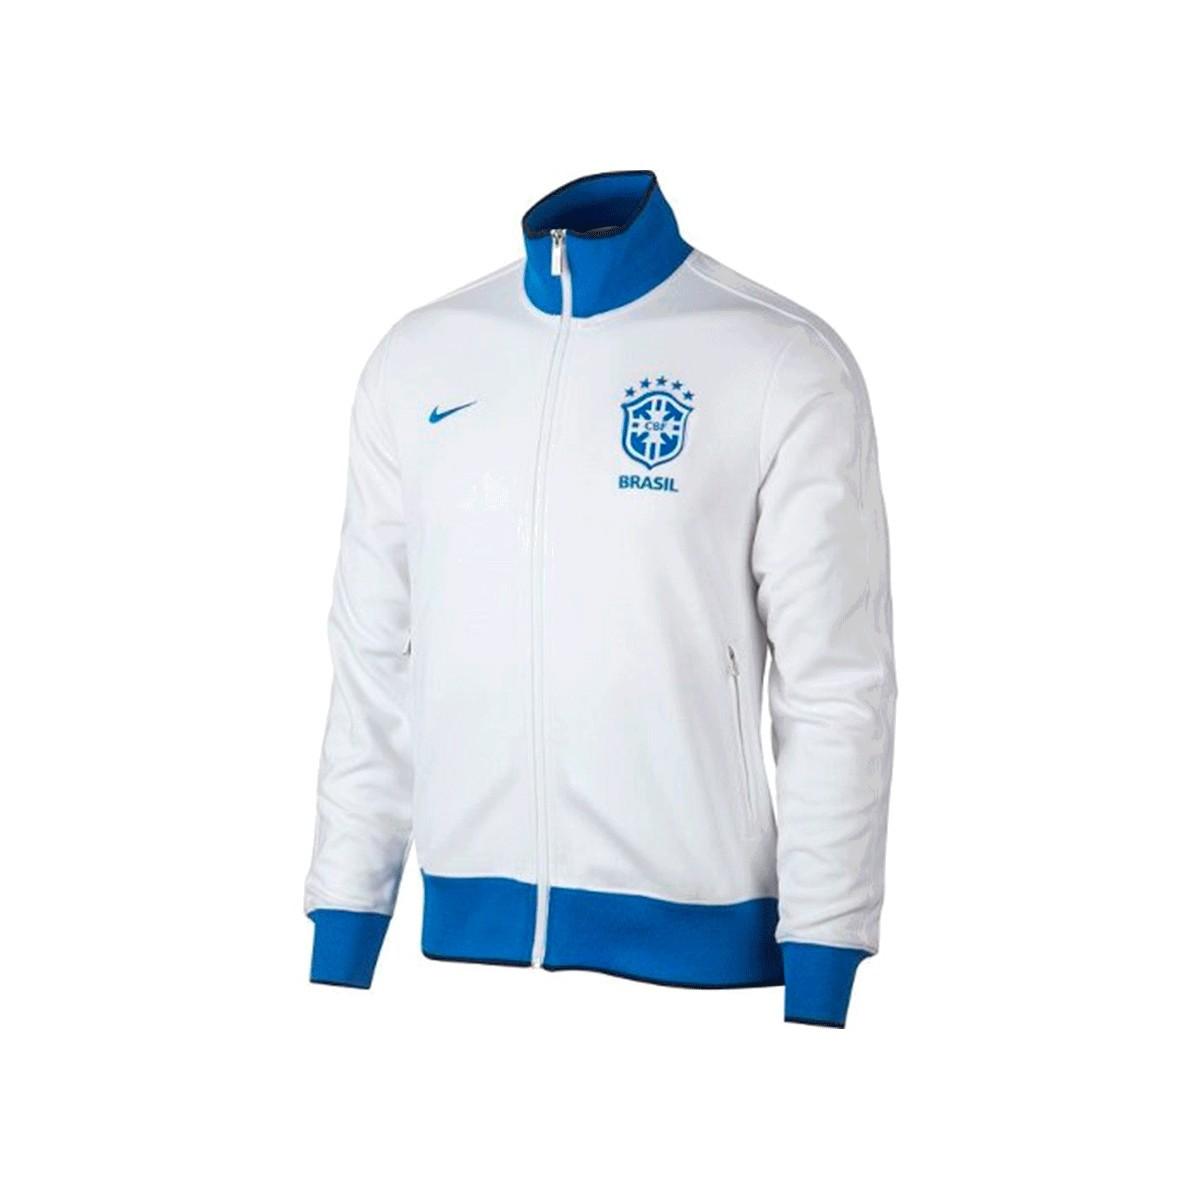 Jaqueta Nike CBF Masculino Branco